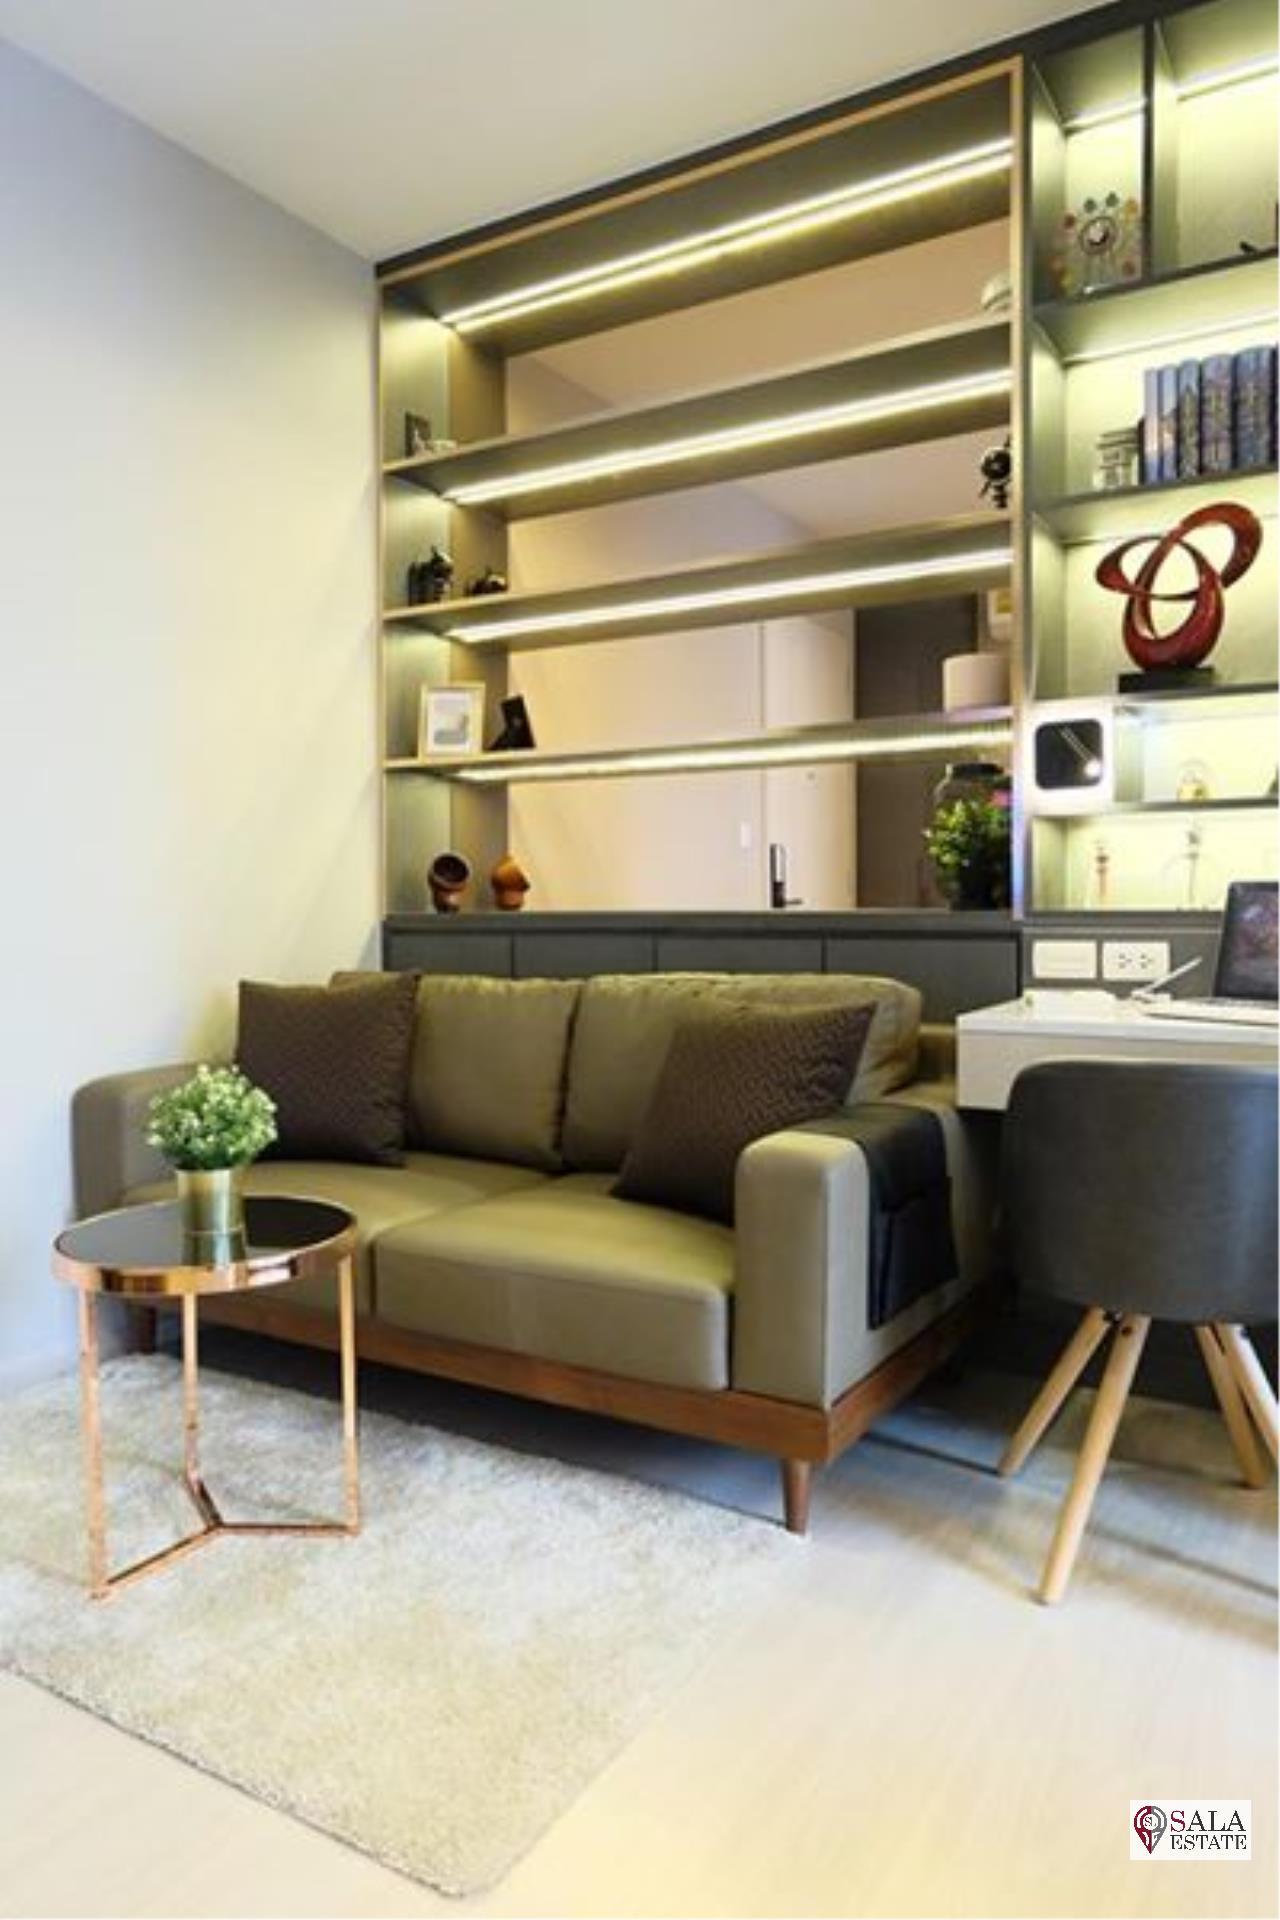 SALA ESTATE Agency's LIFE SUKHUMVIT 48 – BTS PHRA KHANONG 2